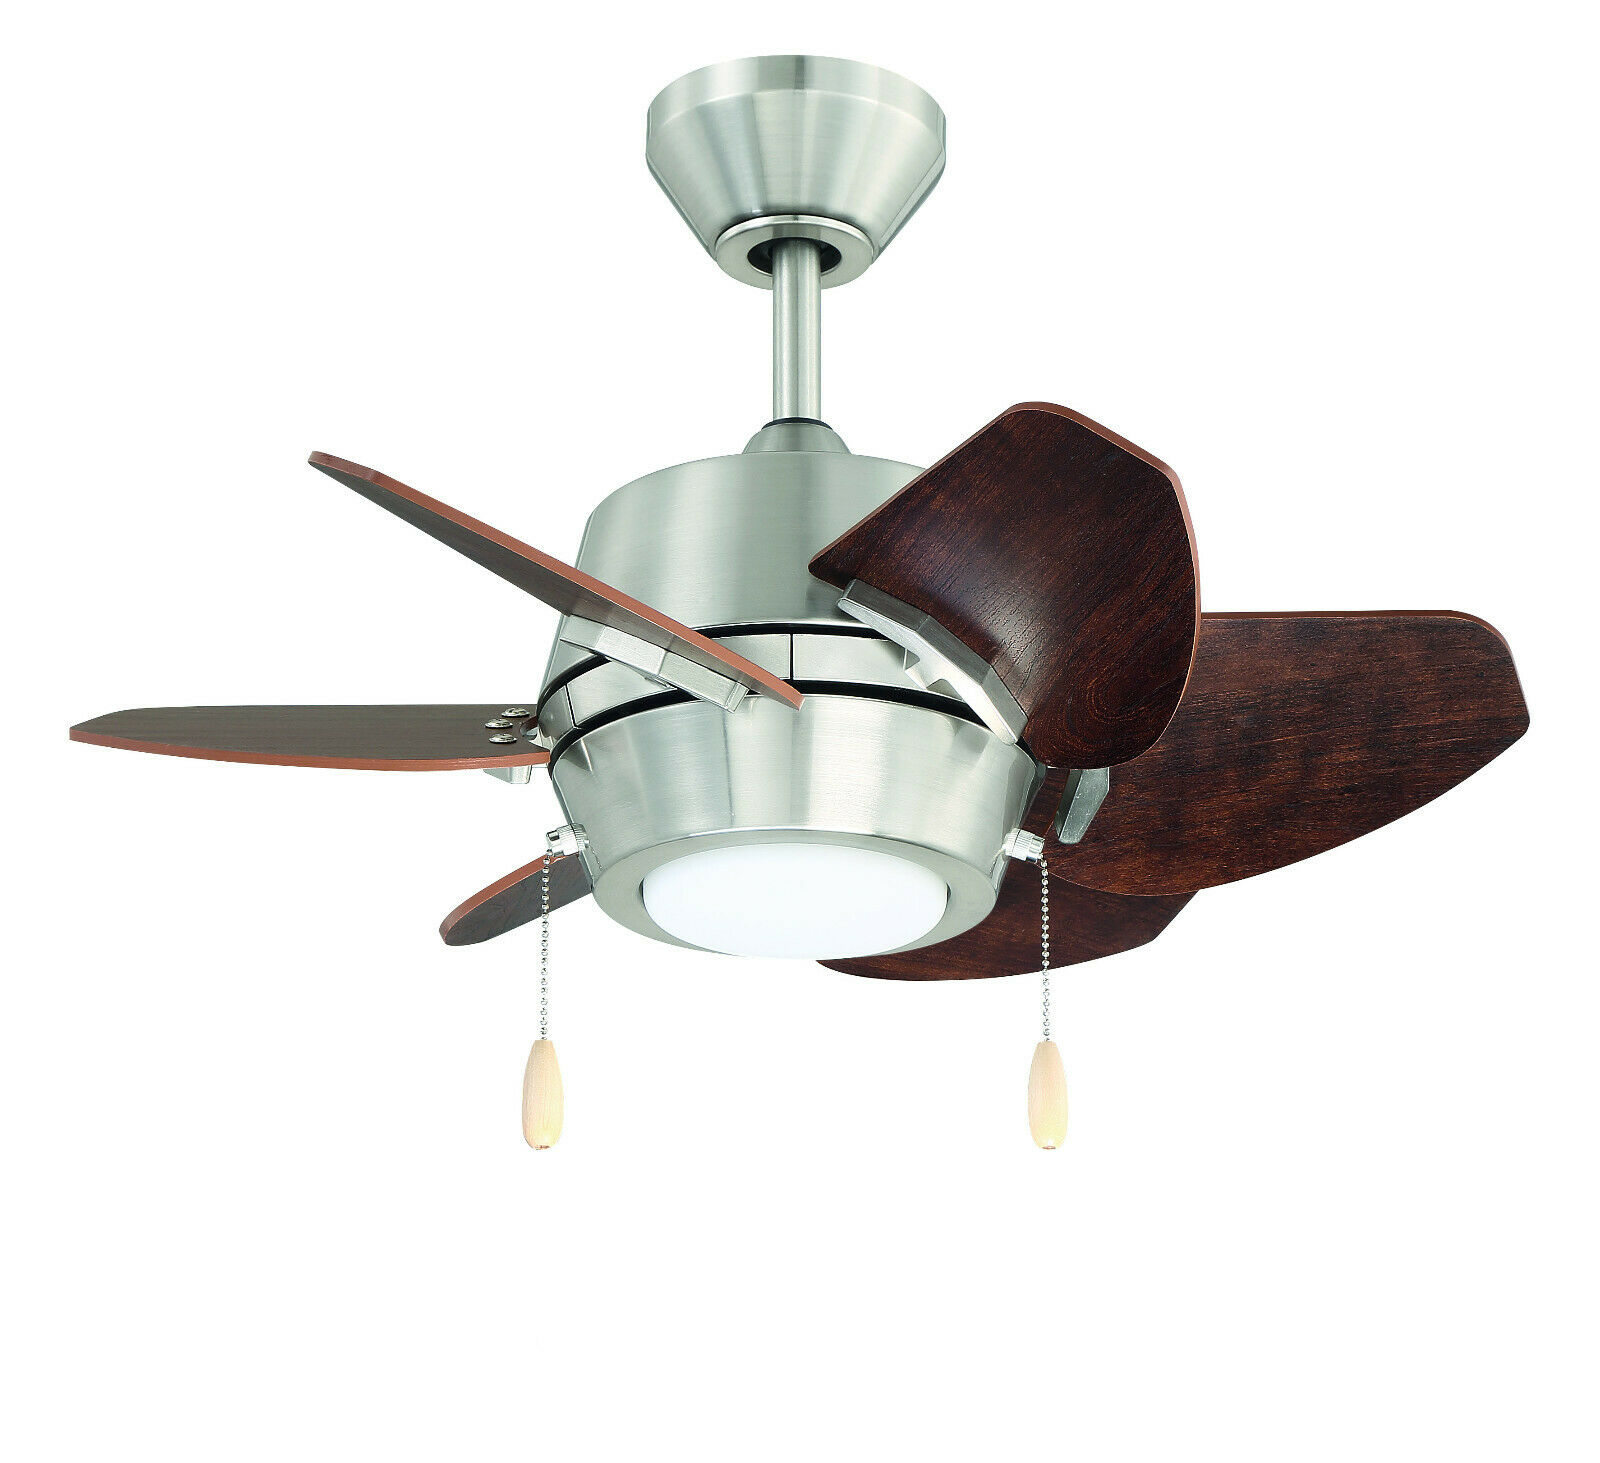 Seasons Torrena 42 Dual Mount Ceiling Fan Brushed Nickel W Led Bowl Light Kit For Sale Online Ebay